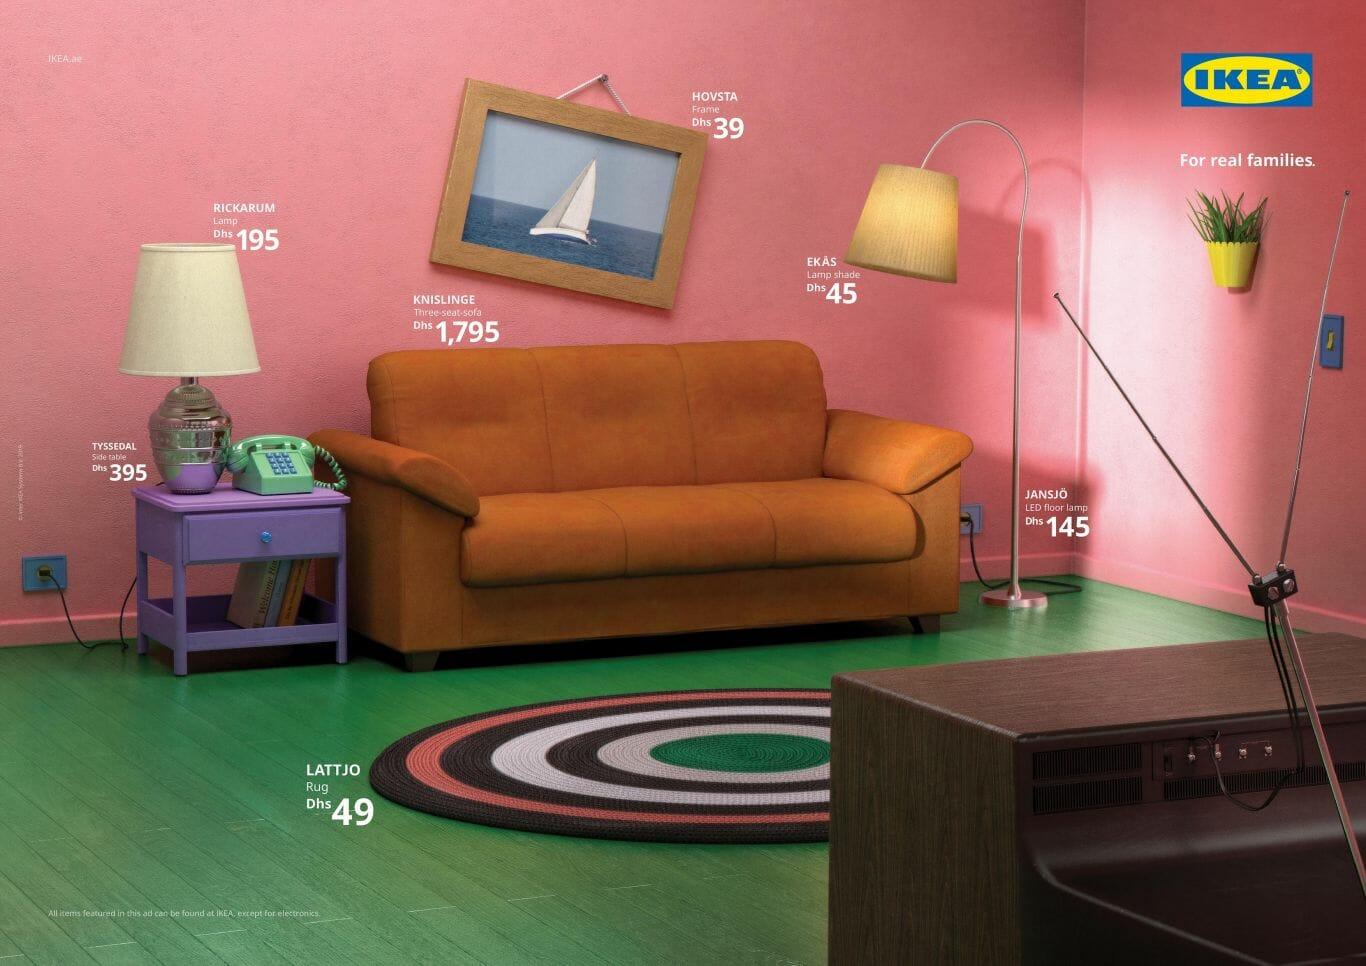 ambientes televisão IKEA 2